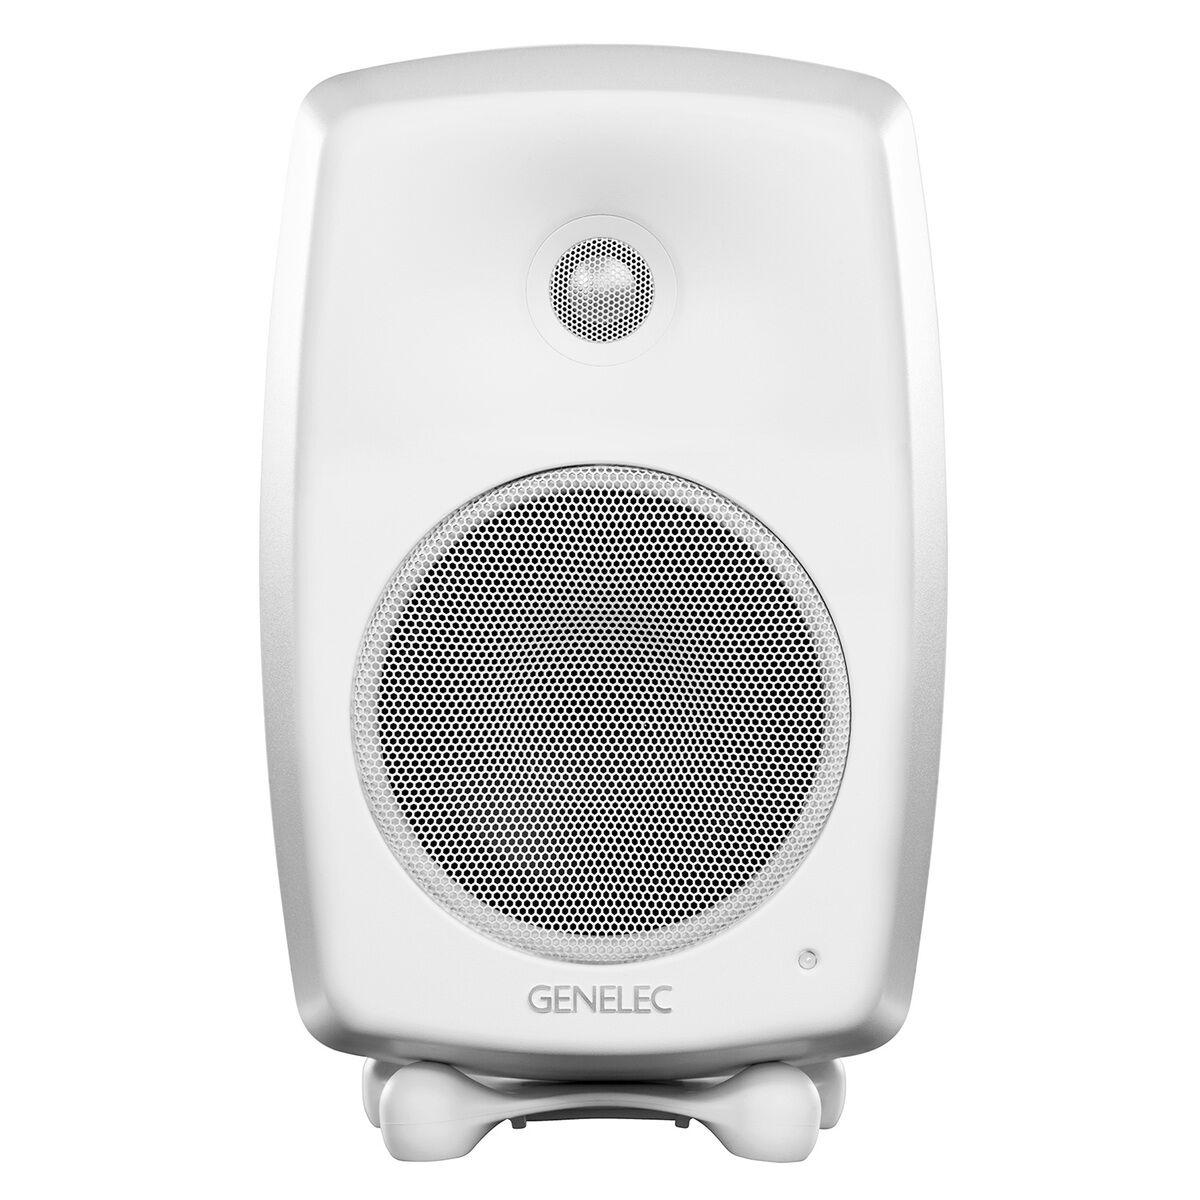 Genelec G Three (B) active speaker, white